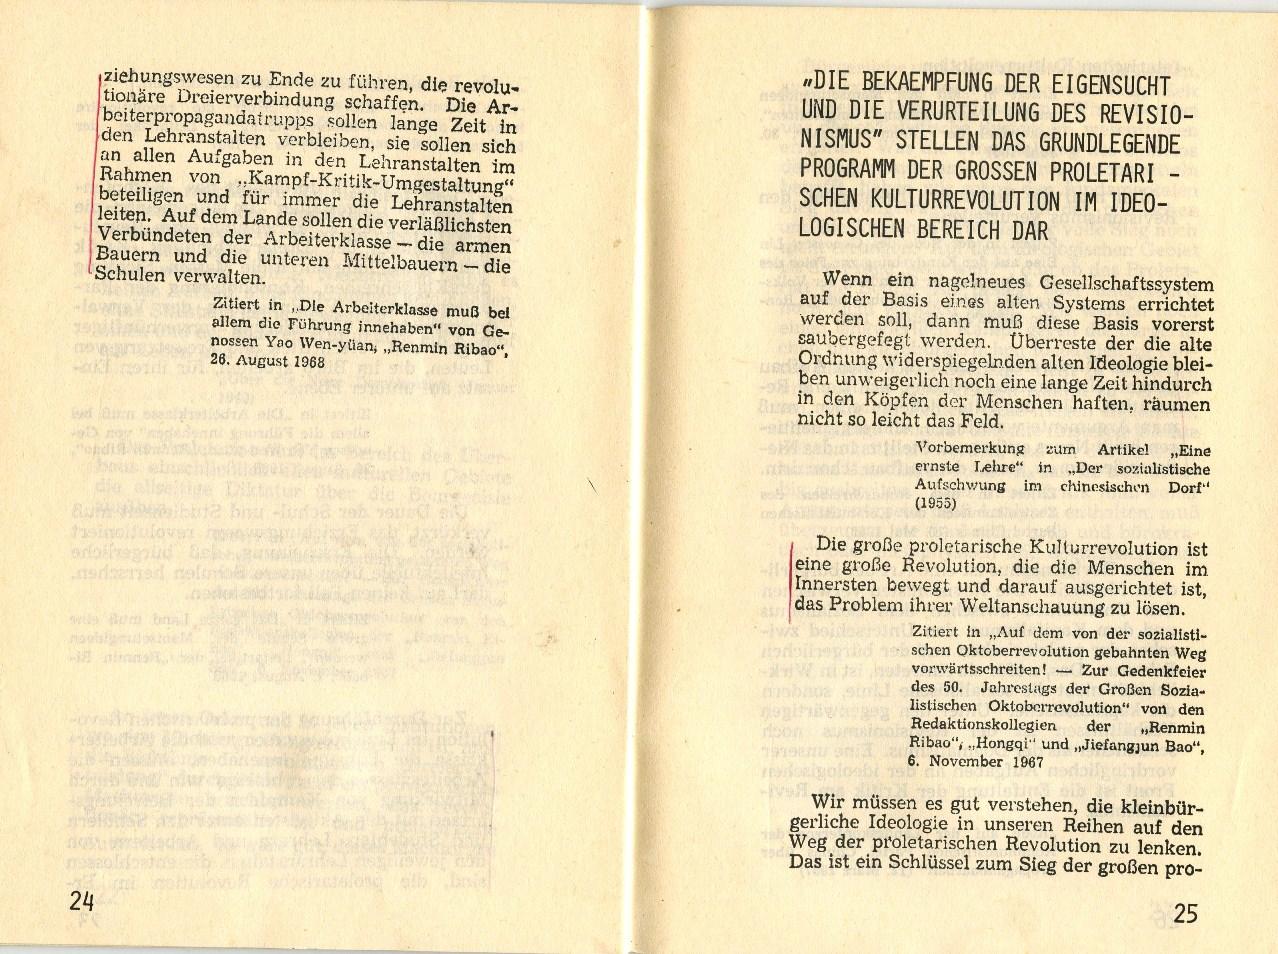 ZB_Mao_Revolutionstheorie_1971_14